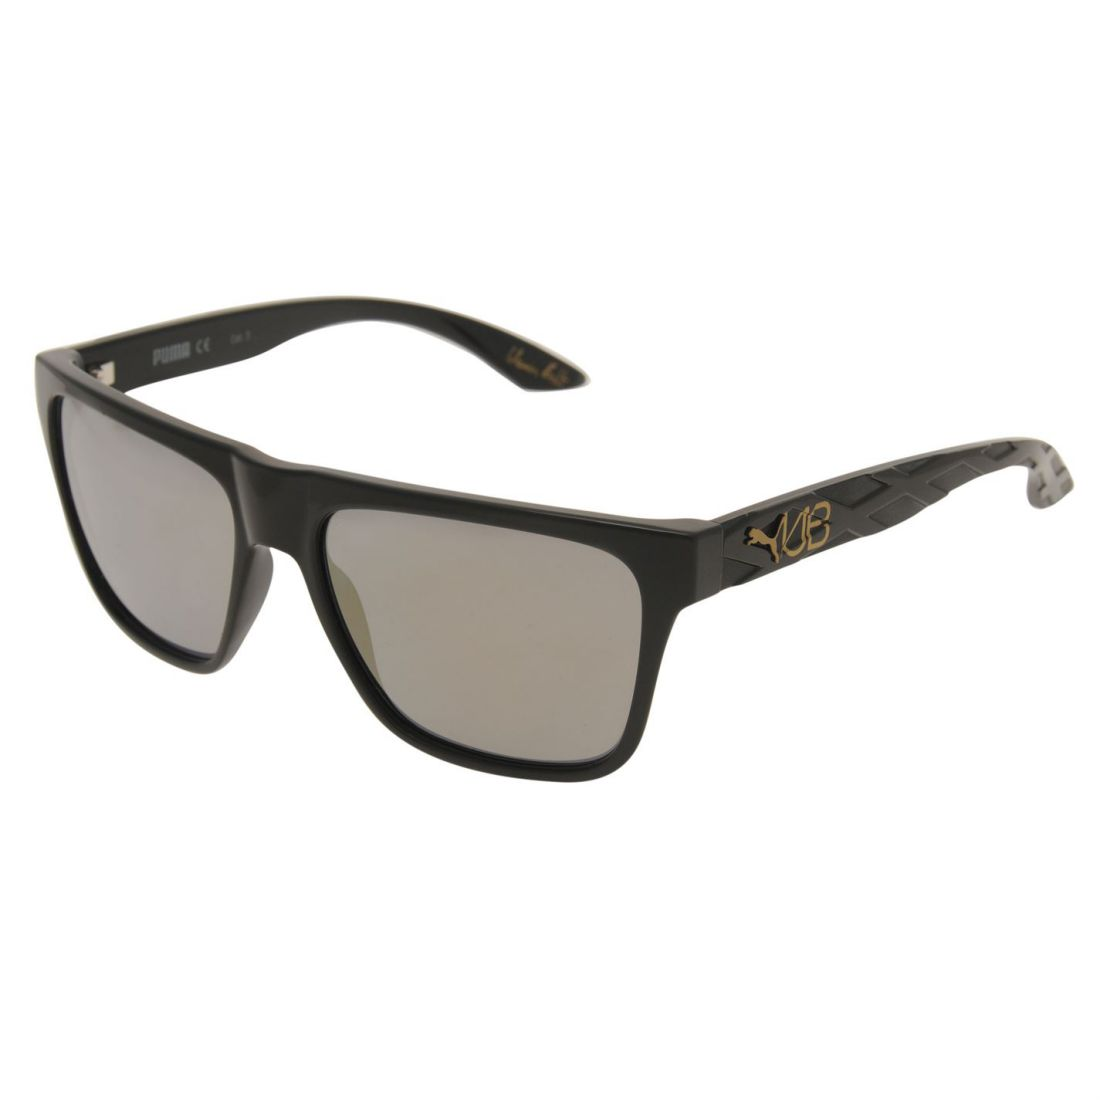 768185540a Details about Puma Unisex Usain Bolt Sunglasses Running Rectangular Square